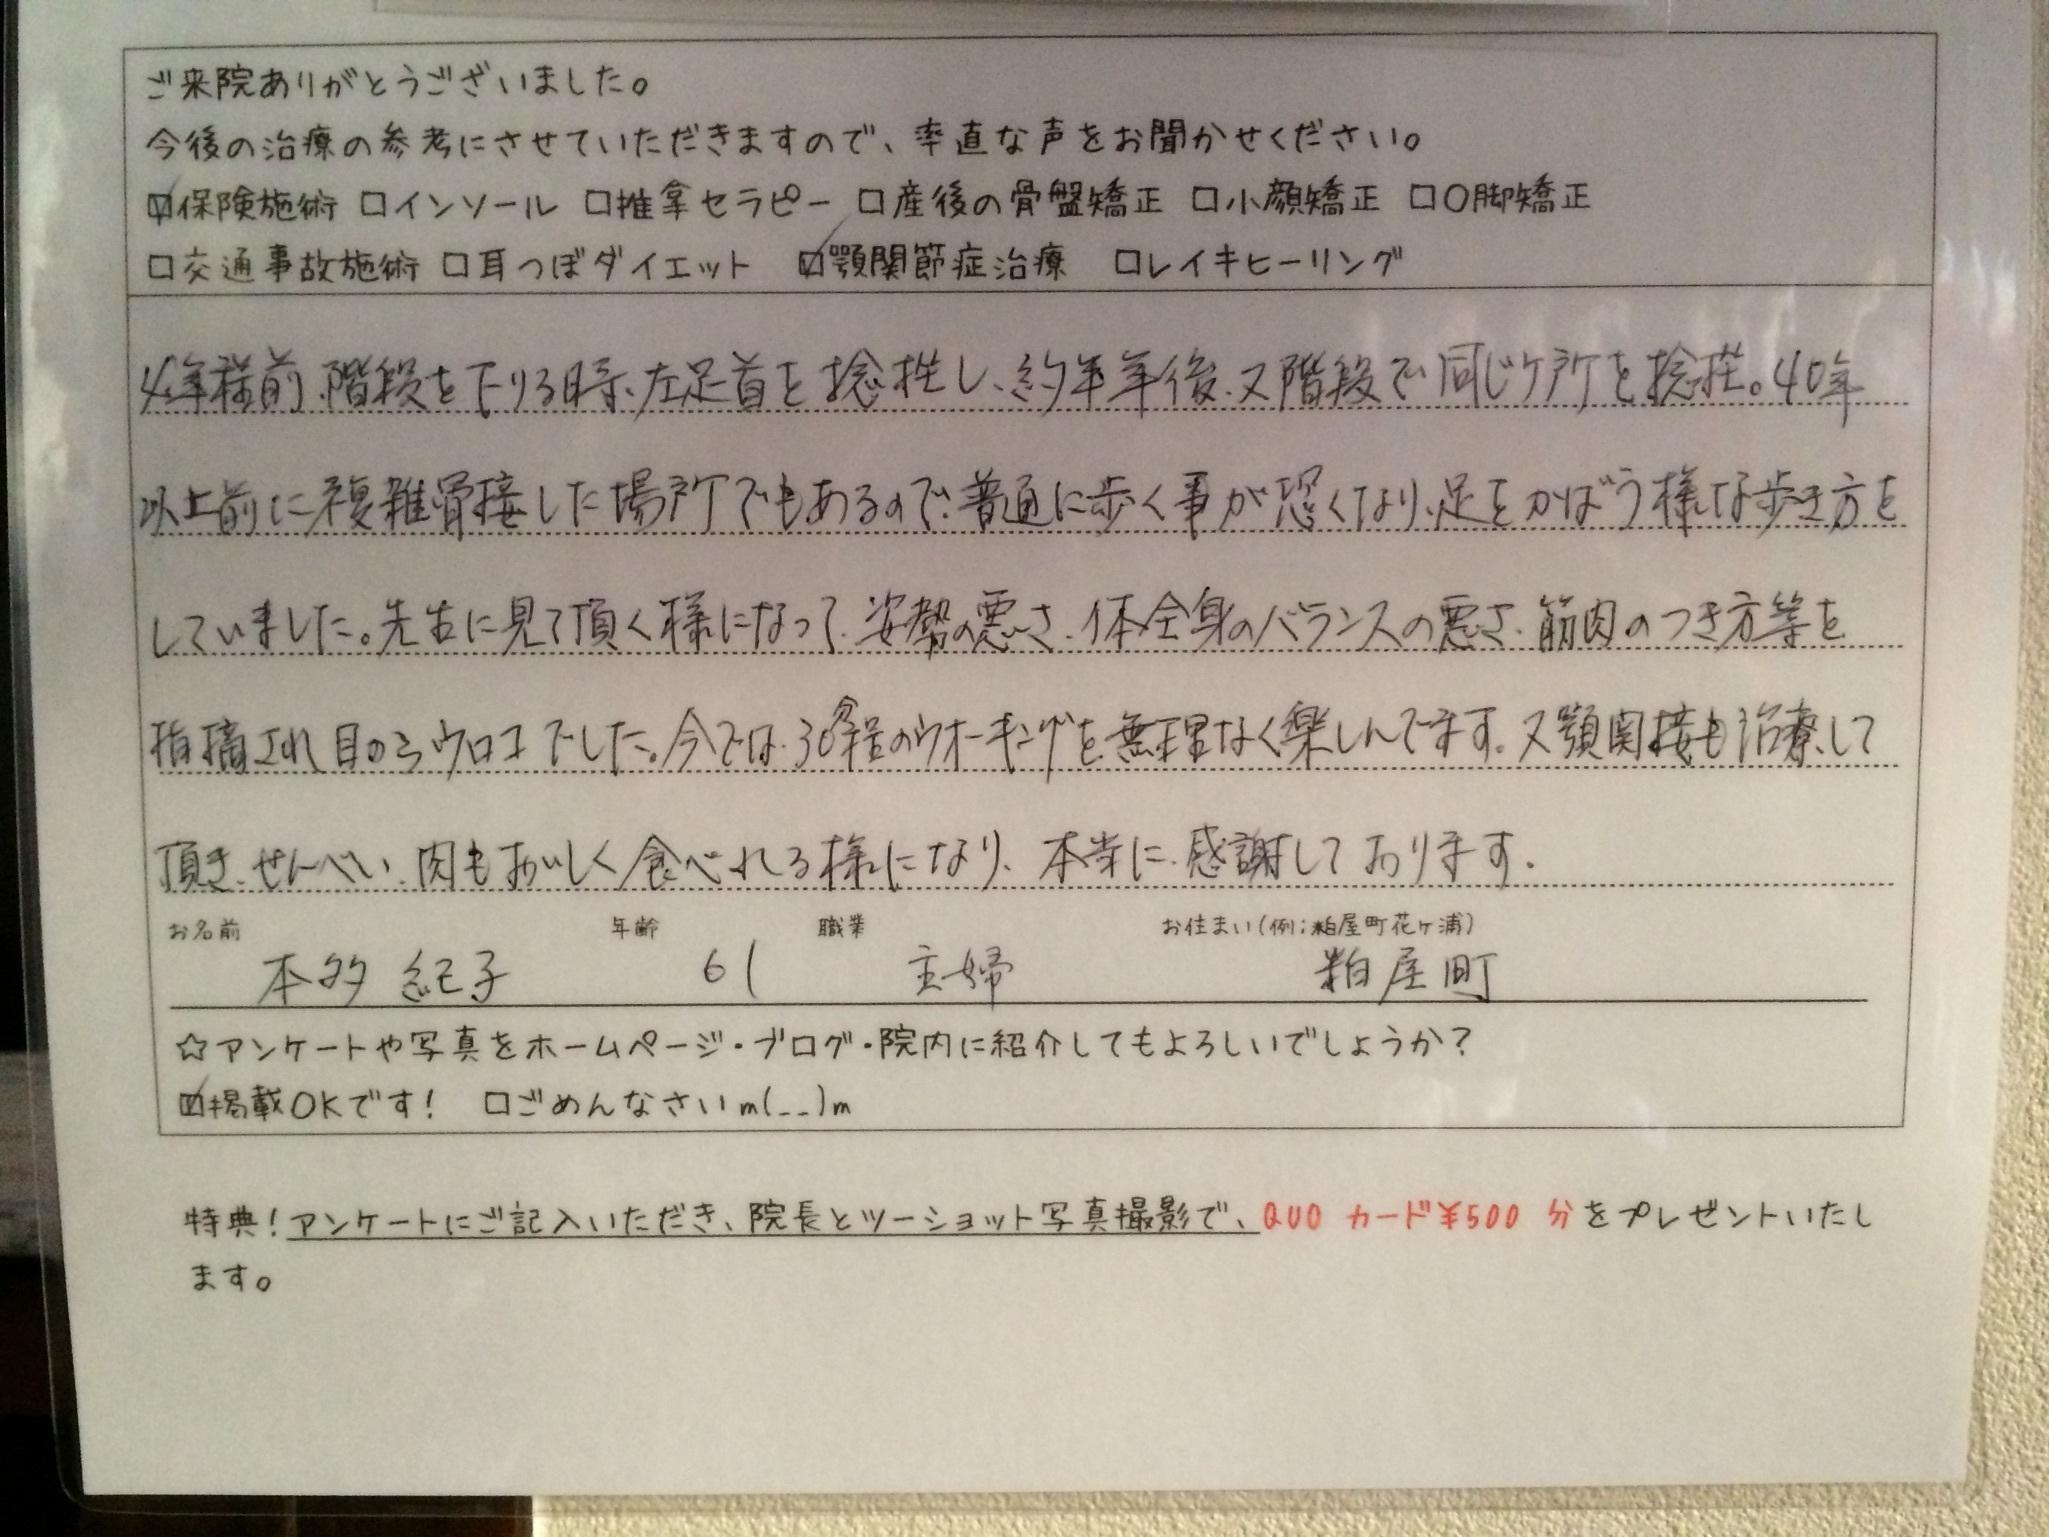 20161201081910c30.jpg